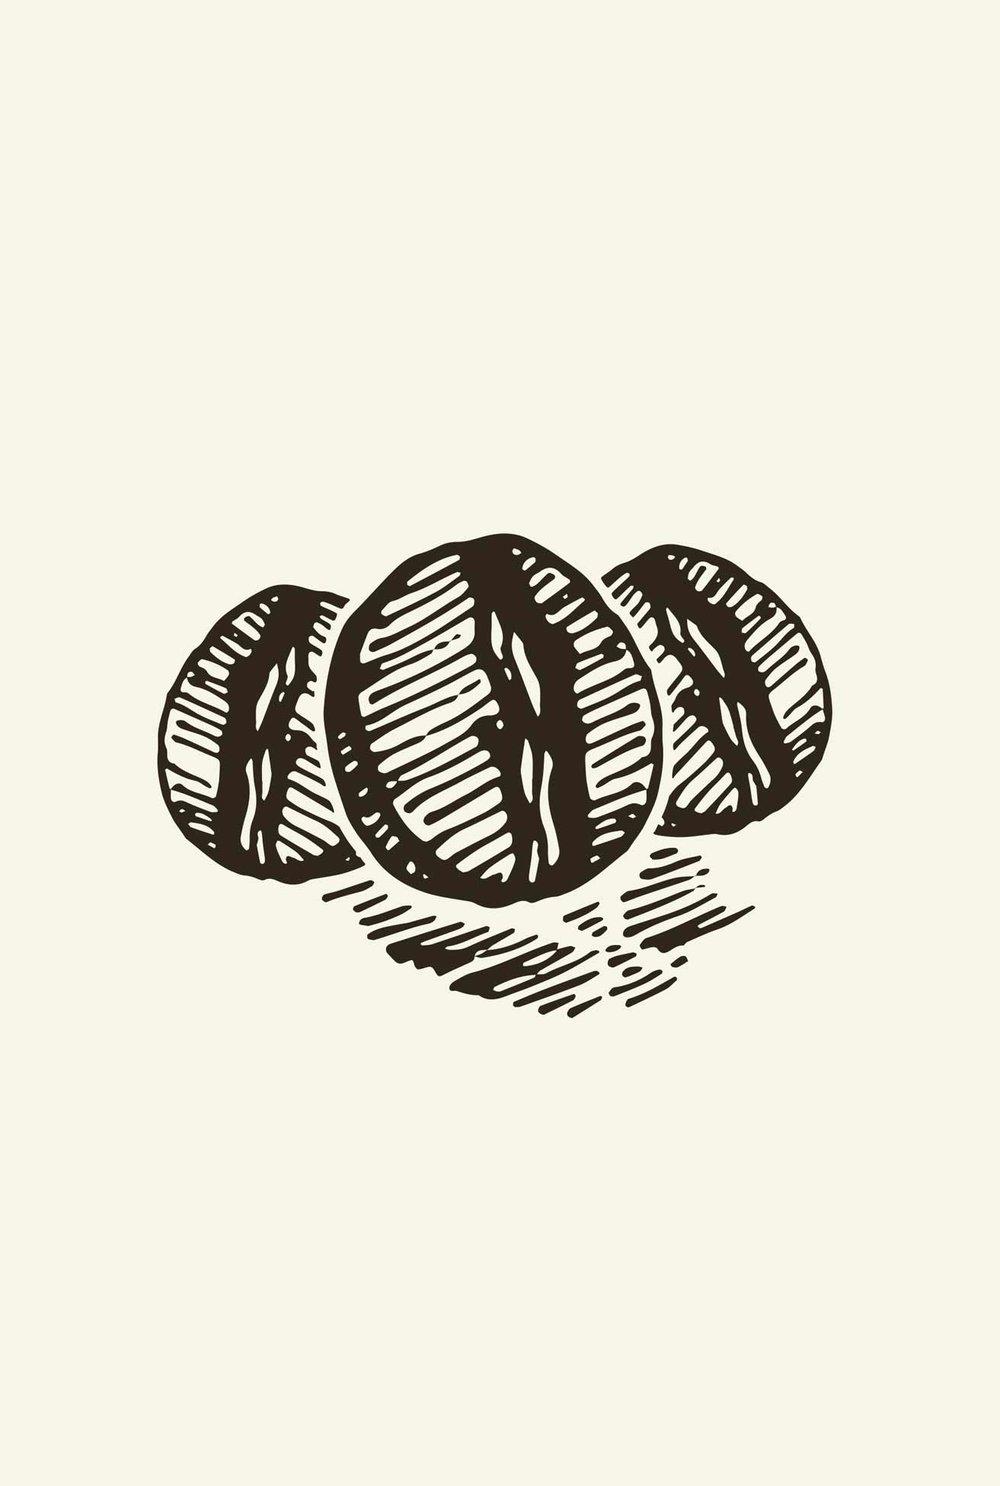 chemcoffee-vert_bean-illustration.jpg